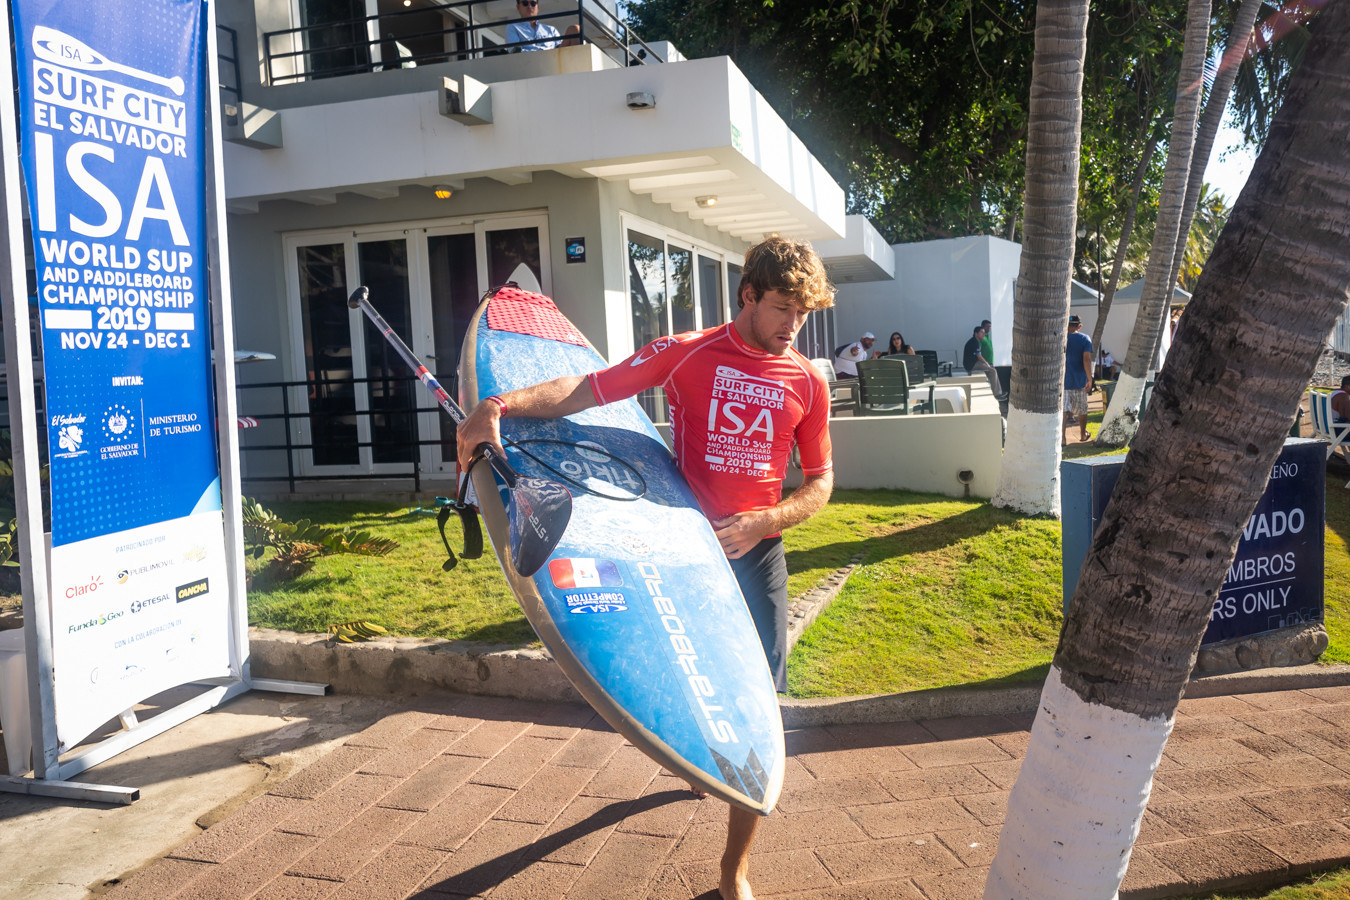 Carpentier and Westdorp lay down SUP surfing gauntlet in El Sunzal